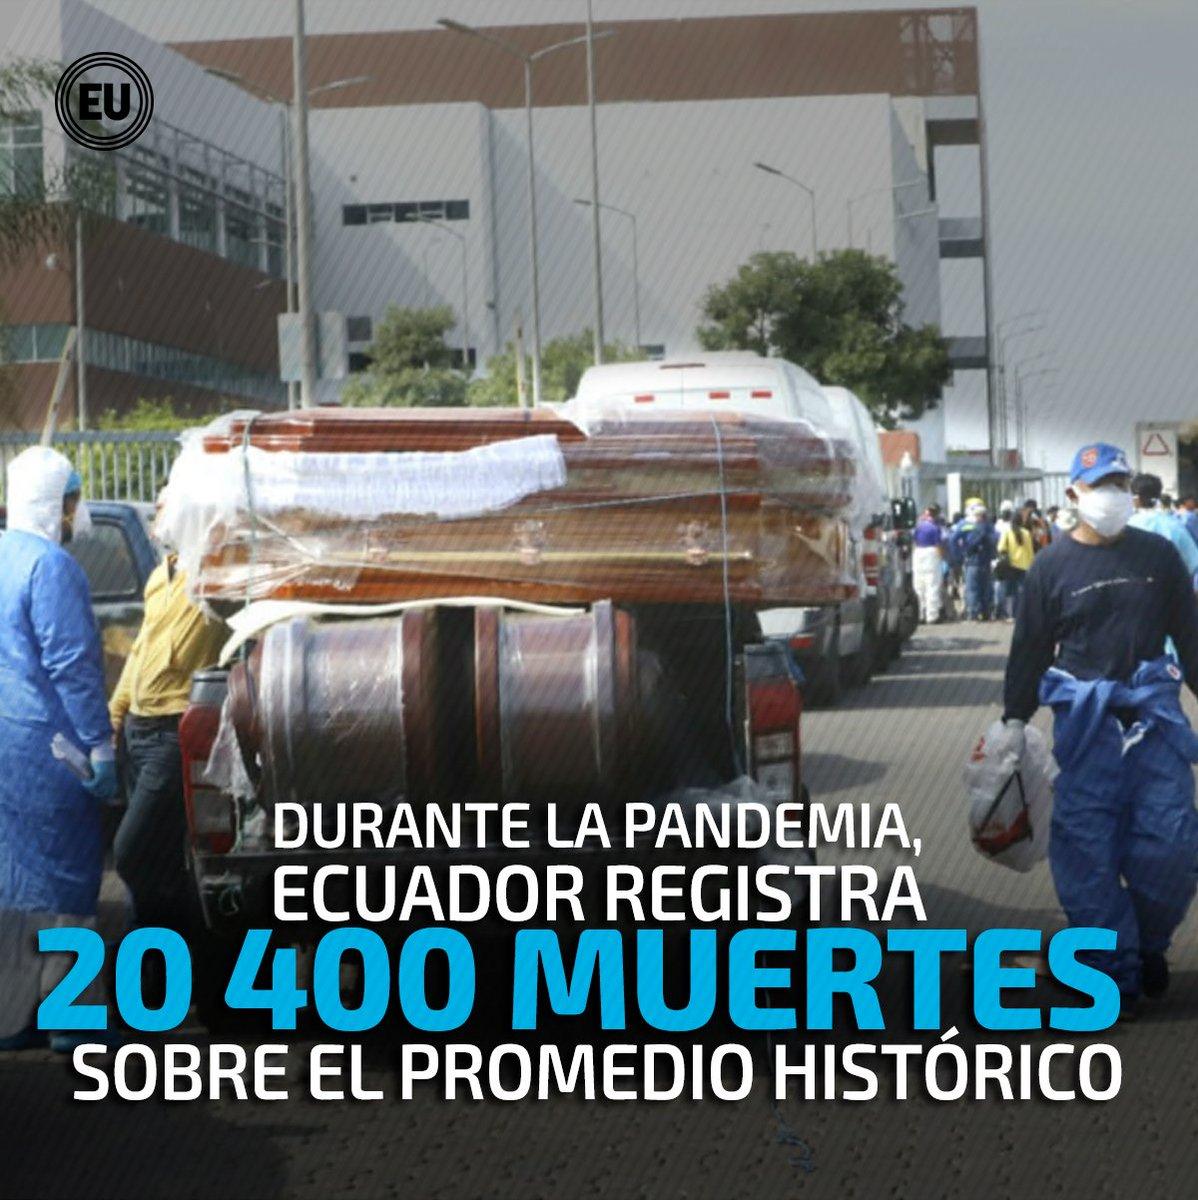 @elferlopezaires @surkishka @Lenin #ElPeorGobiernoDeLaHistoria #Covidiotas #COVIDIOTS #CoronavirusEnEcuador https://t.co/uhYcfQGSX3